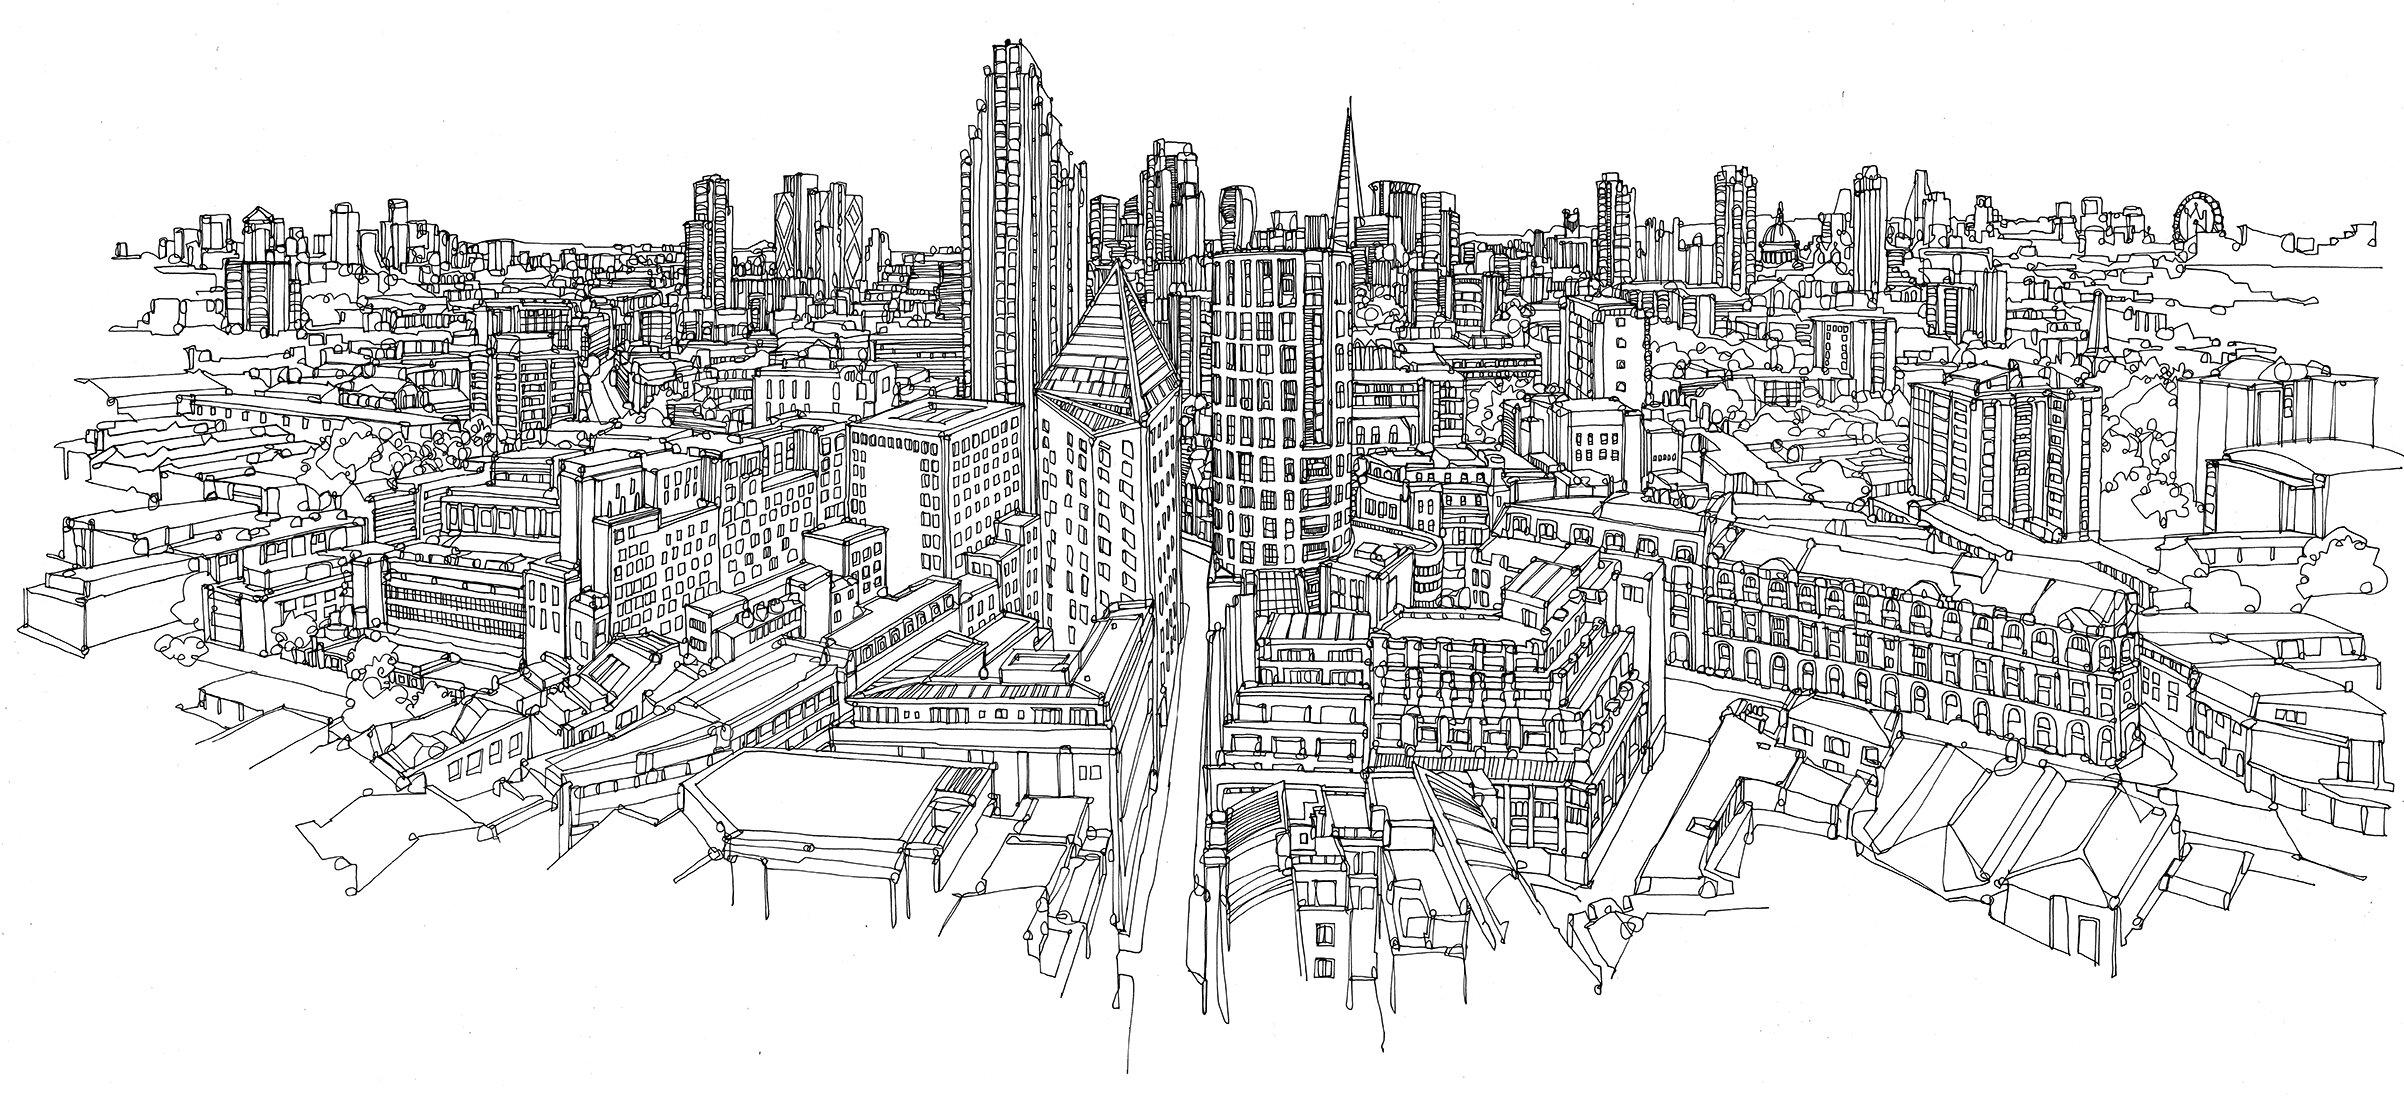 London panorama line drawing.jpg